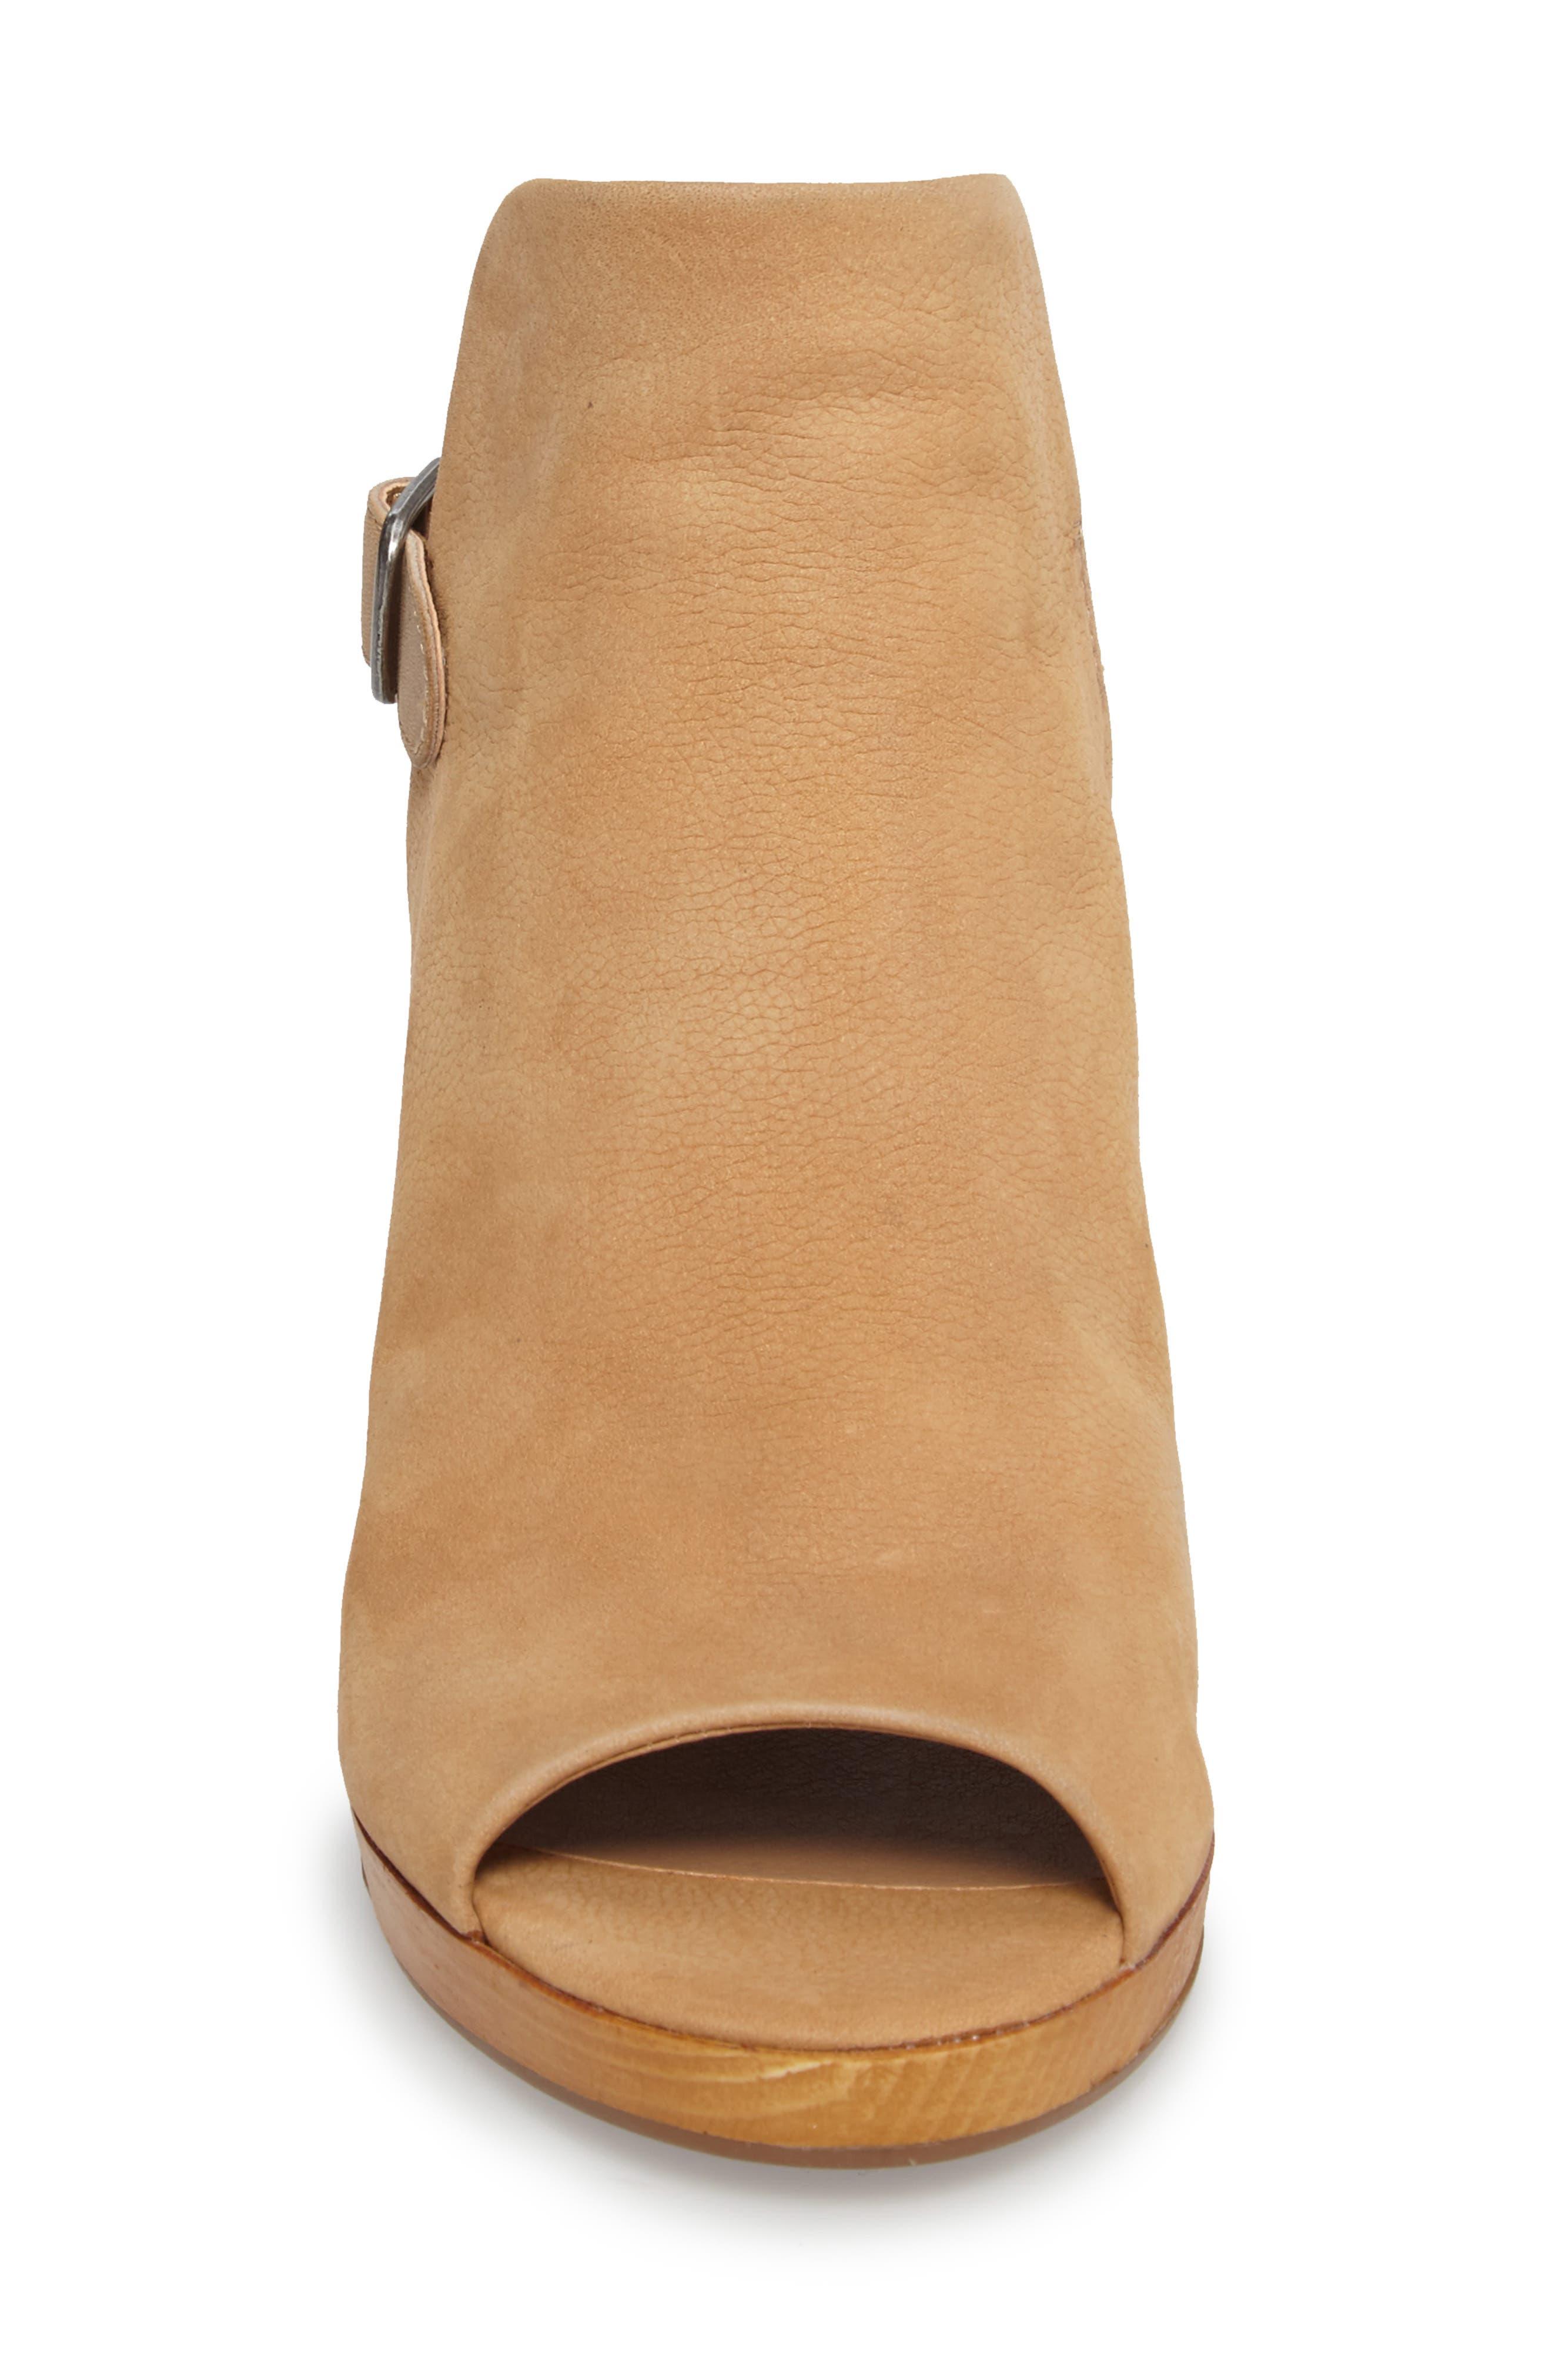 Keralin Wedge Sandal,                             Alternate thumbnail 4, color,                             Glazed Leather